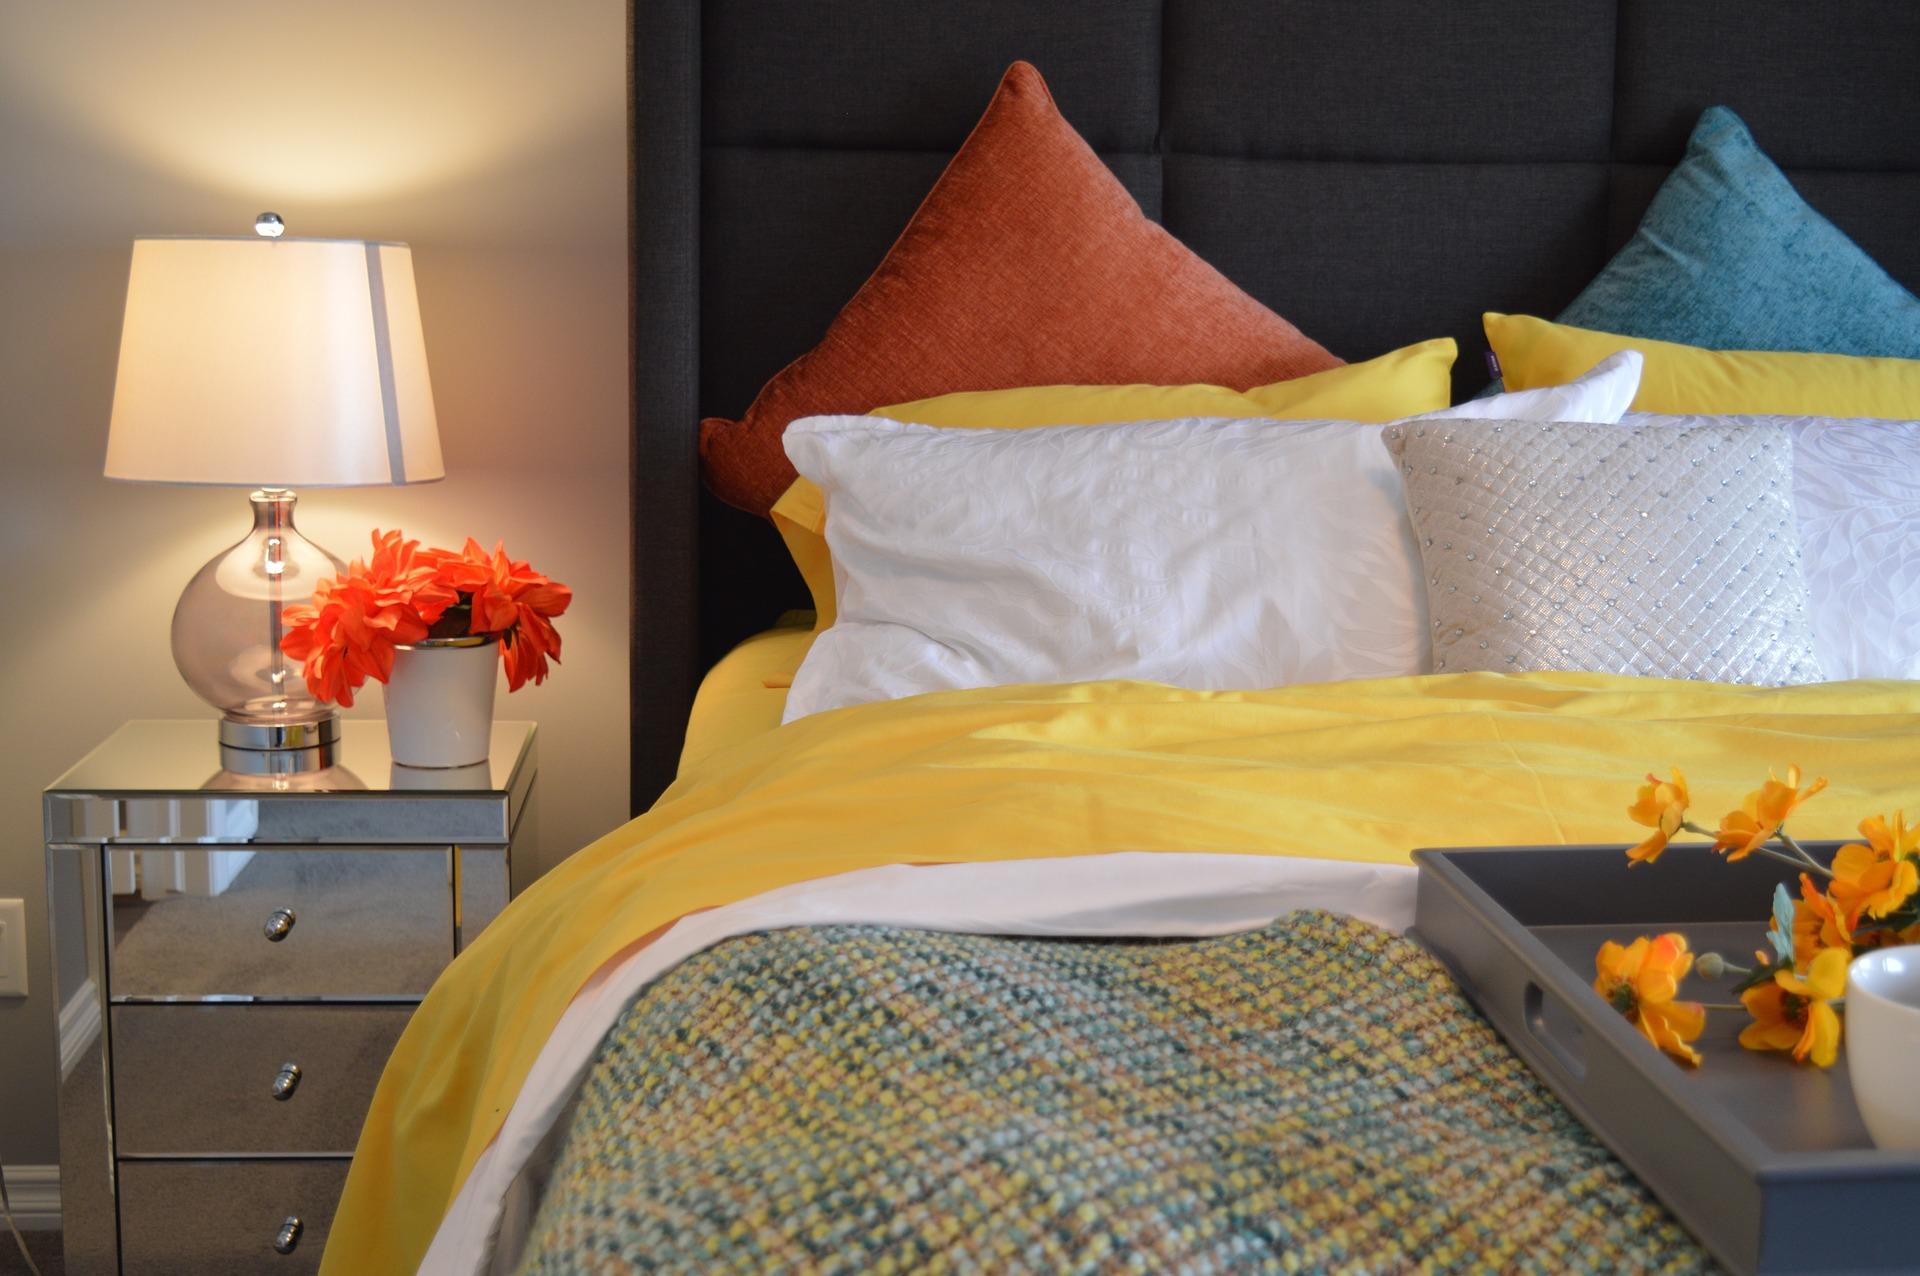 Stylish nightstands